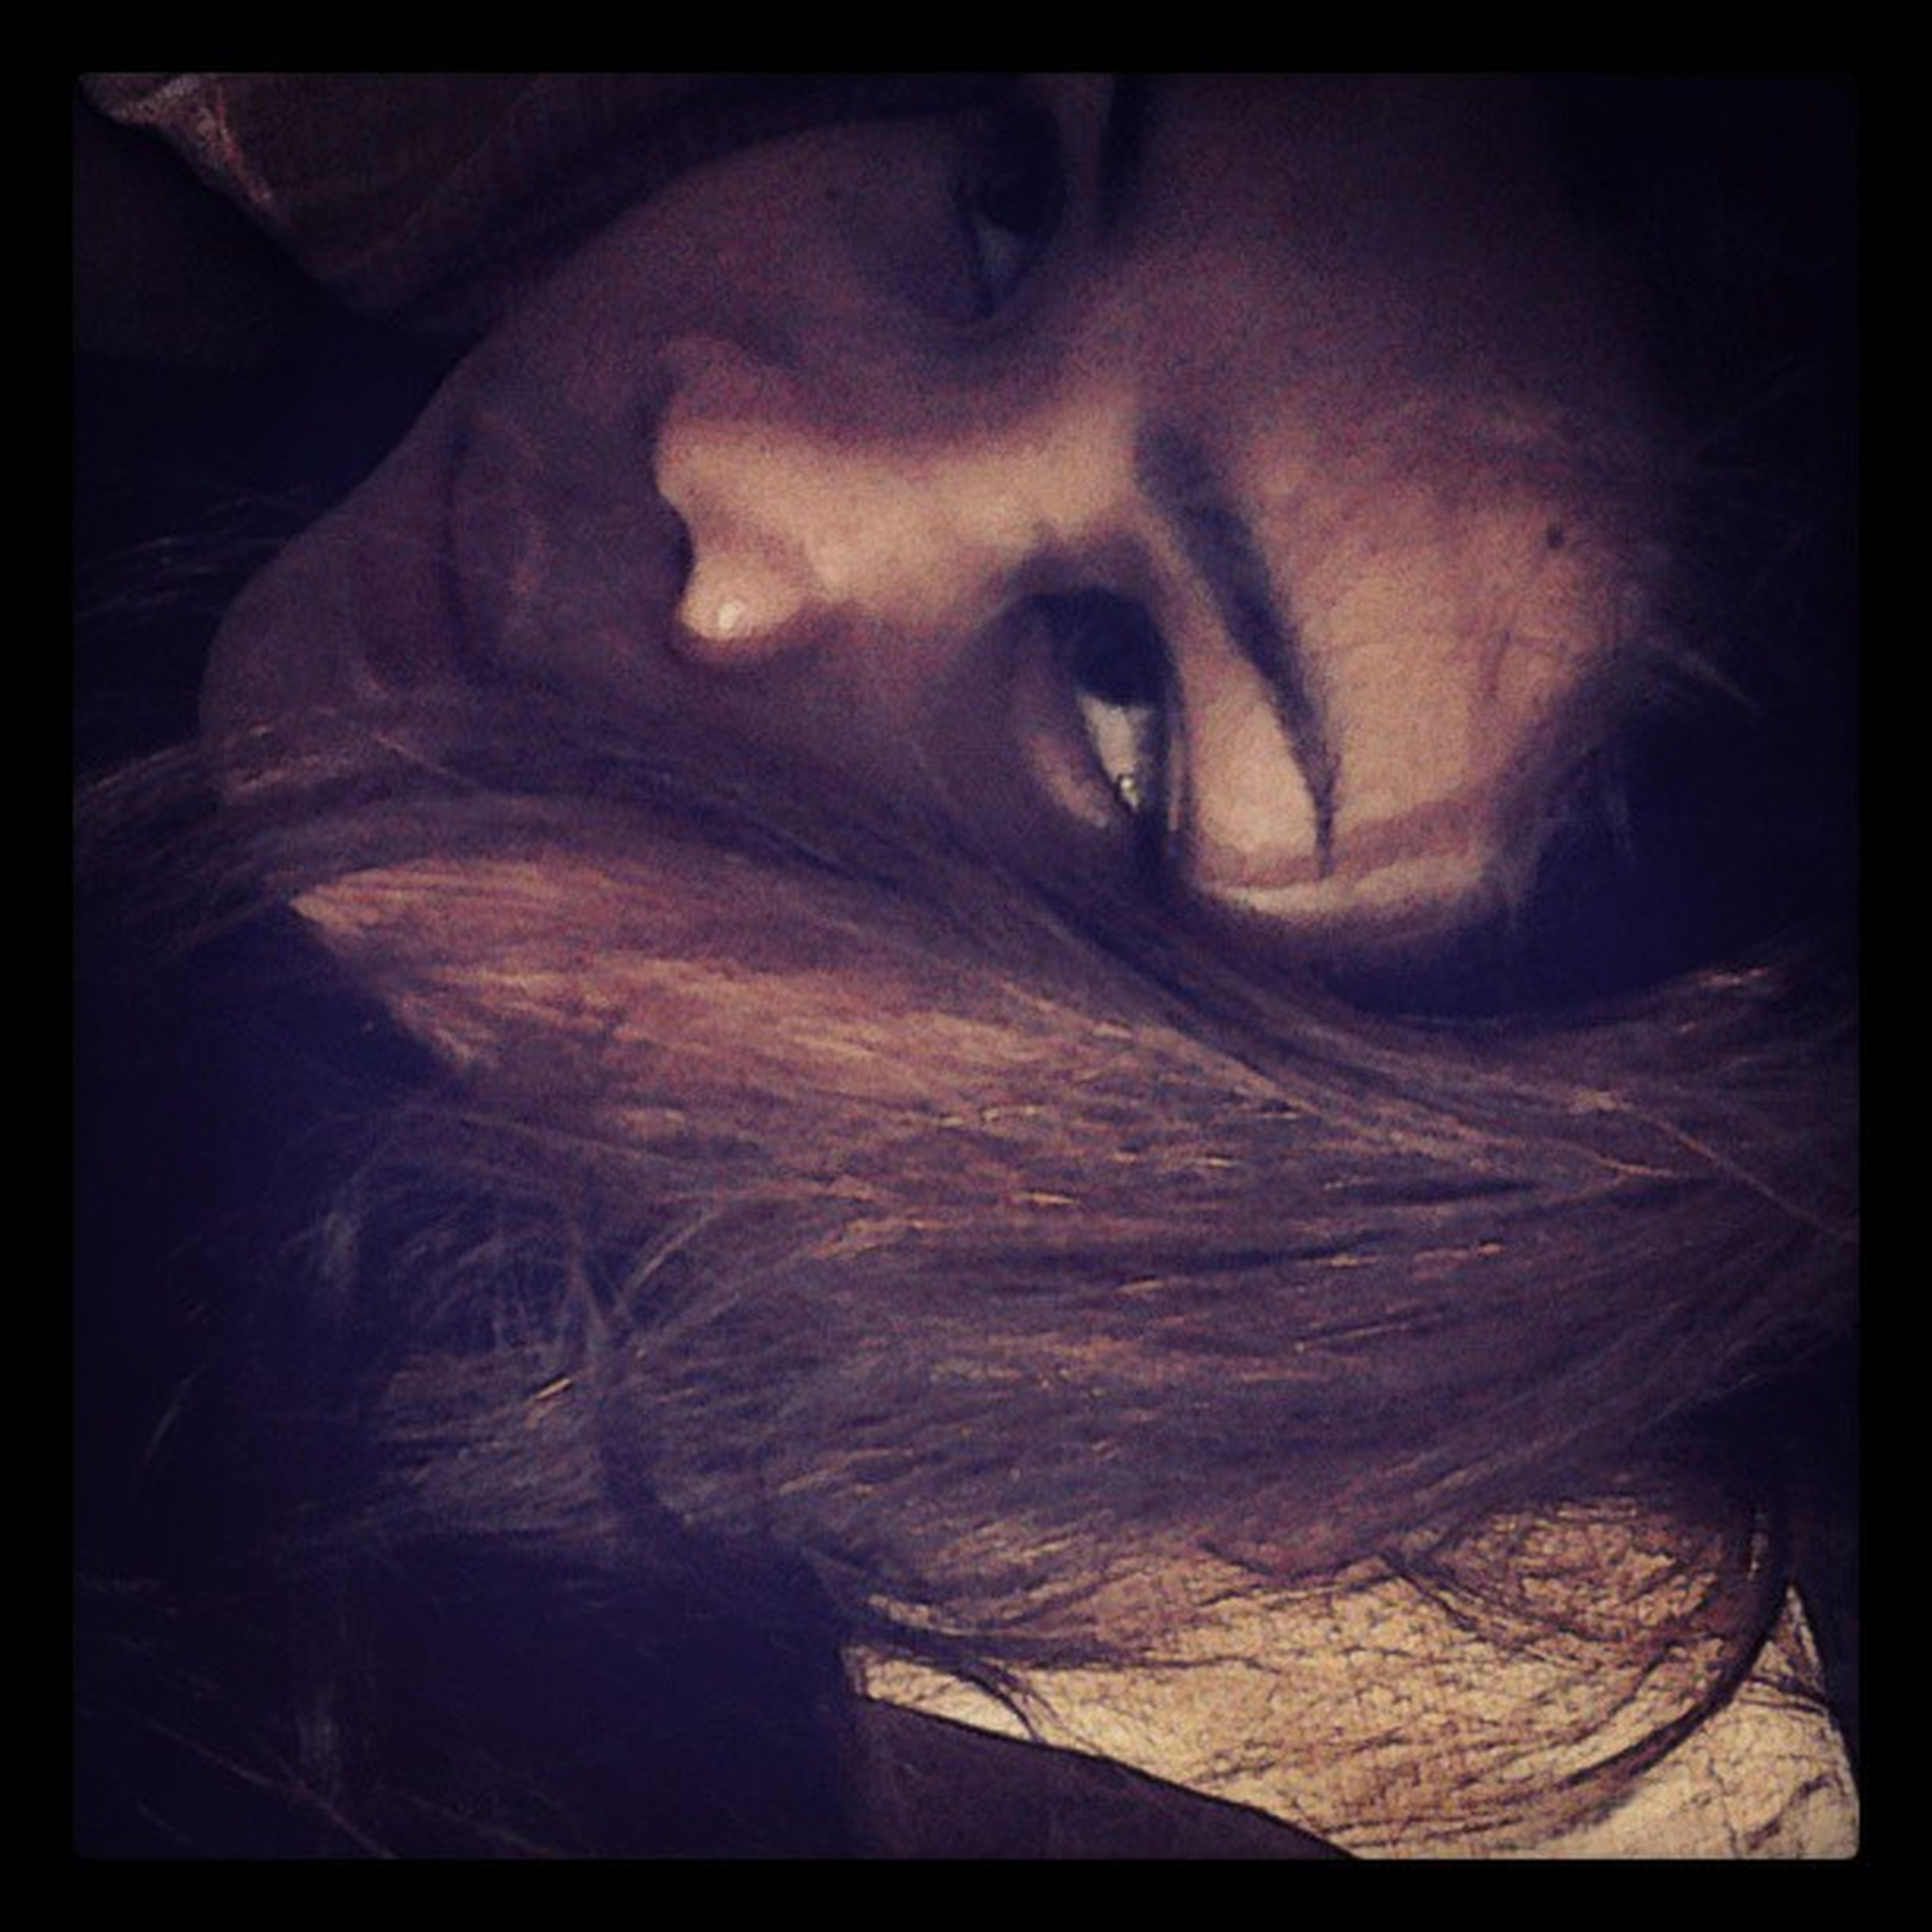 Can't sleep... Problem 's bugging me. Mood Emotions Sundaydawn Dawn Instagram Followme Sad Frustrated Desperate